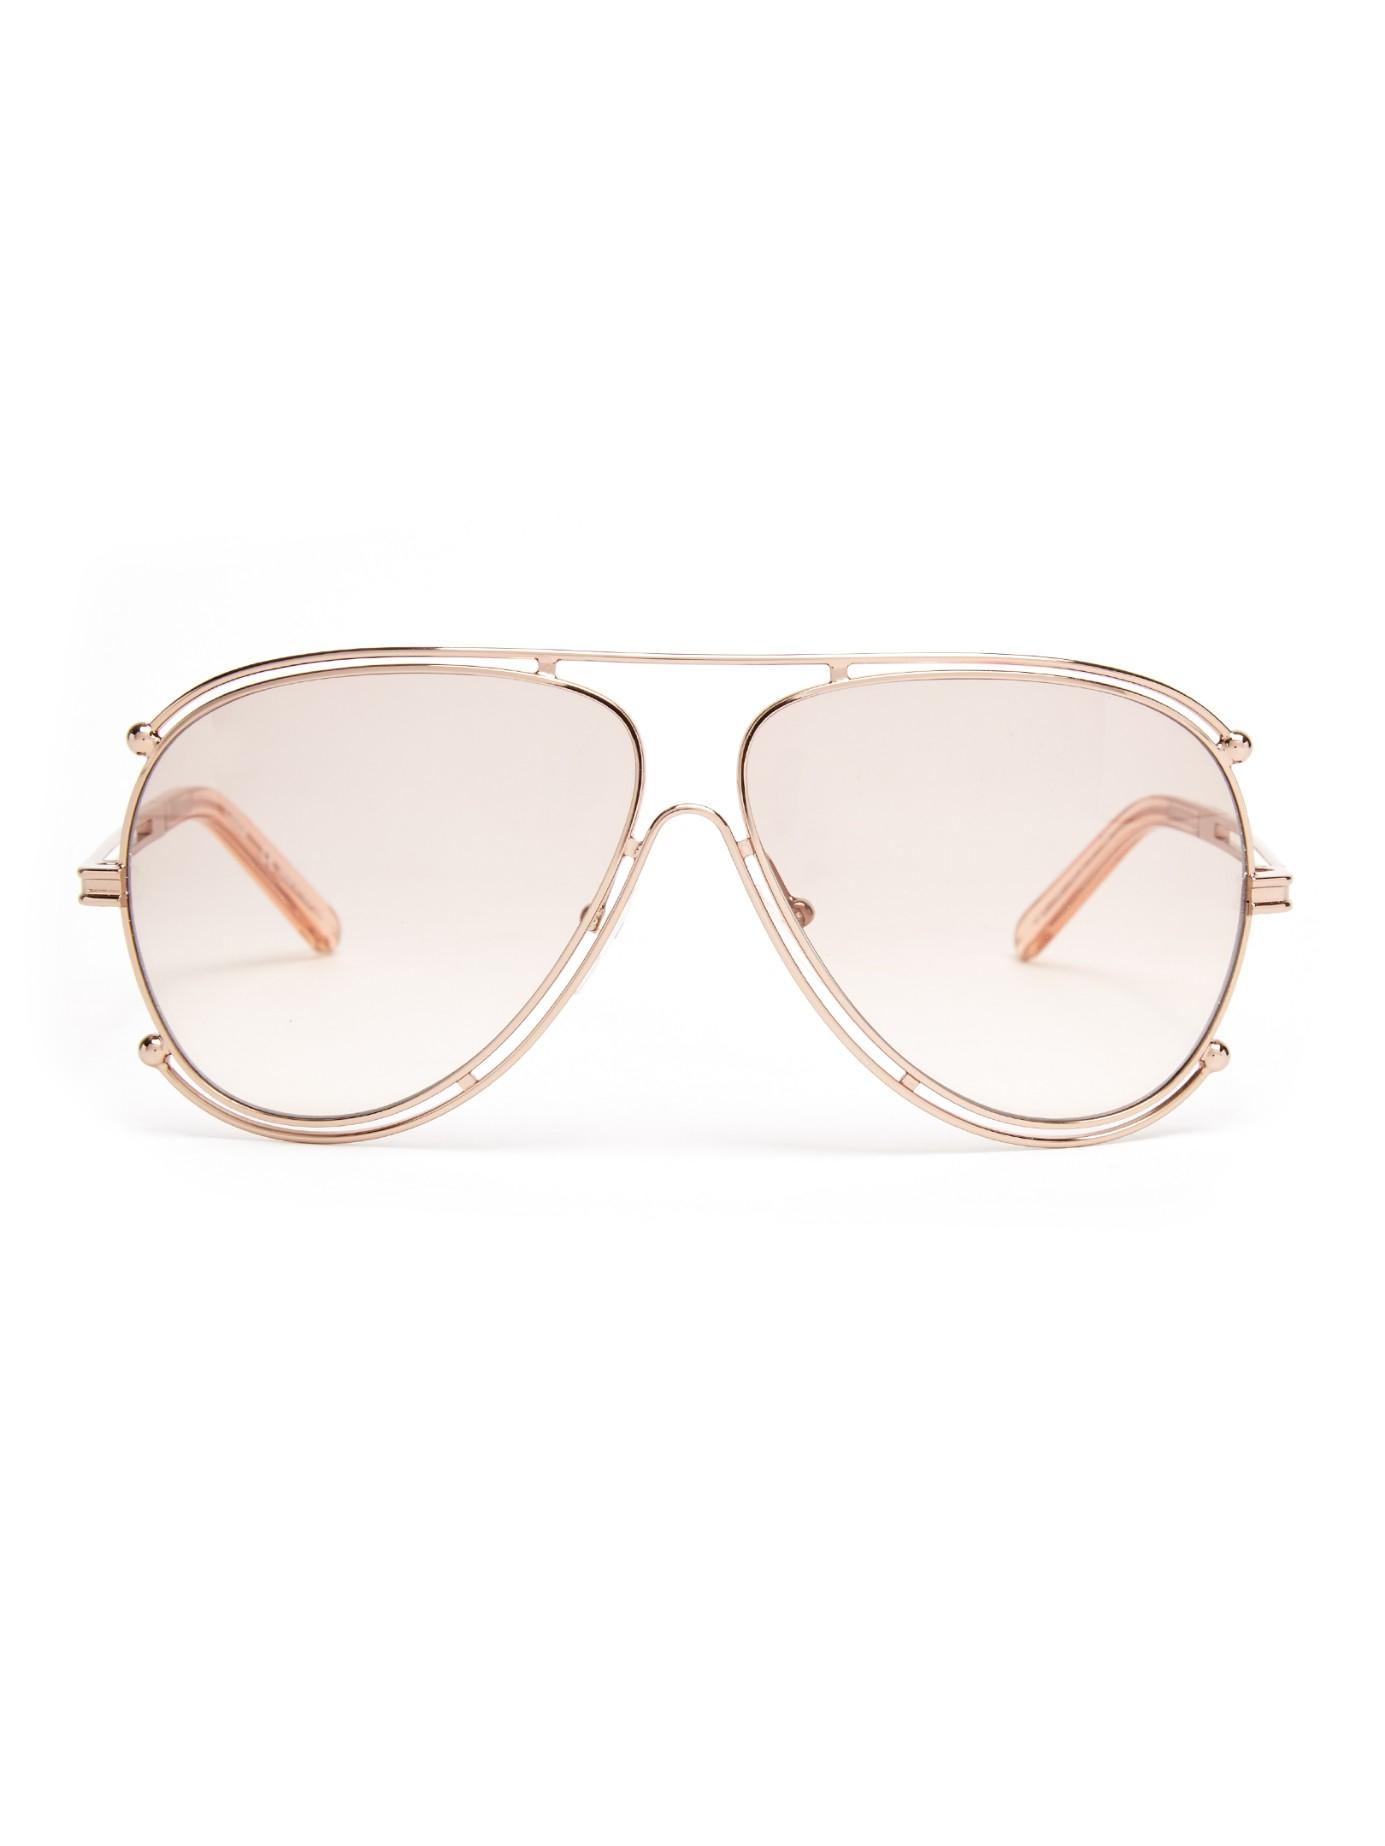 70779490b1f Chloé Isidora Aviator Sunglasses in Pink - Lyst